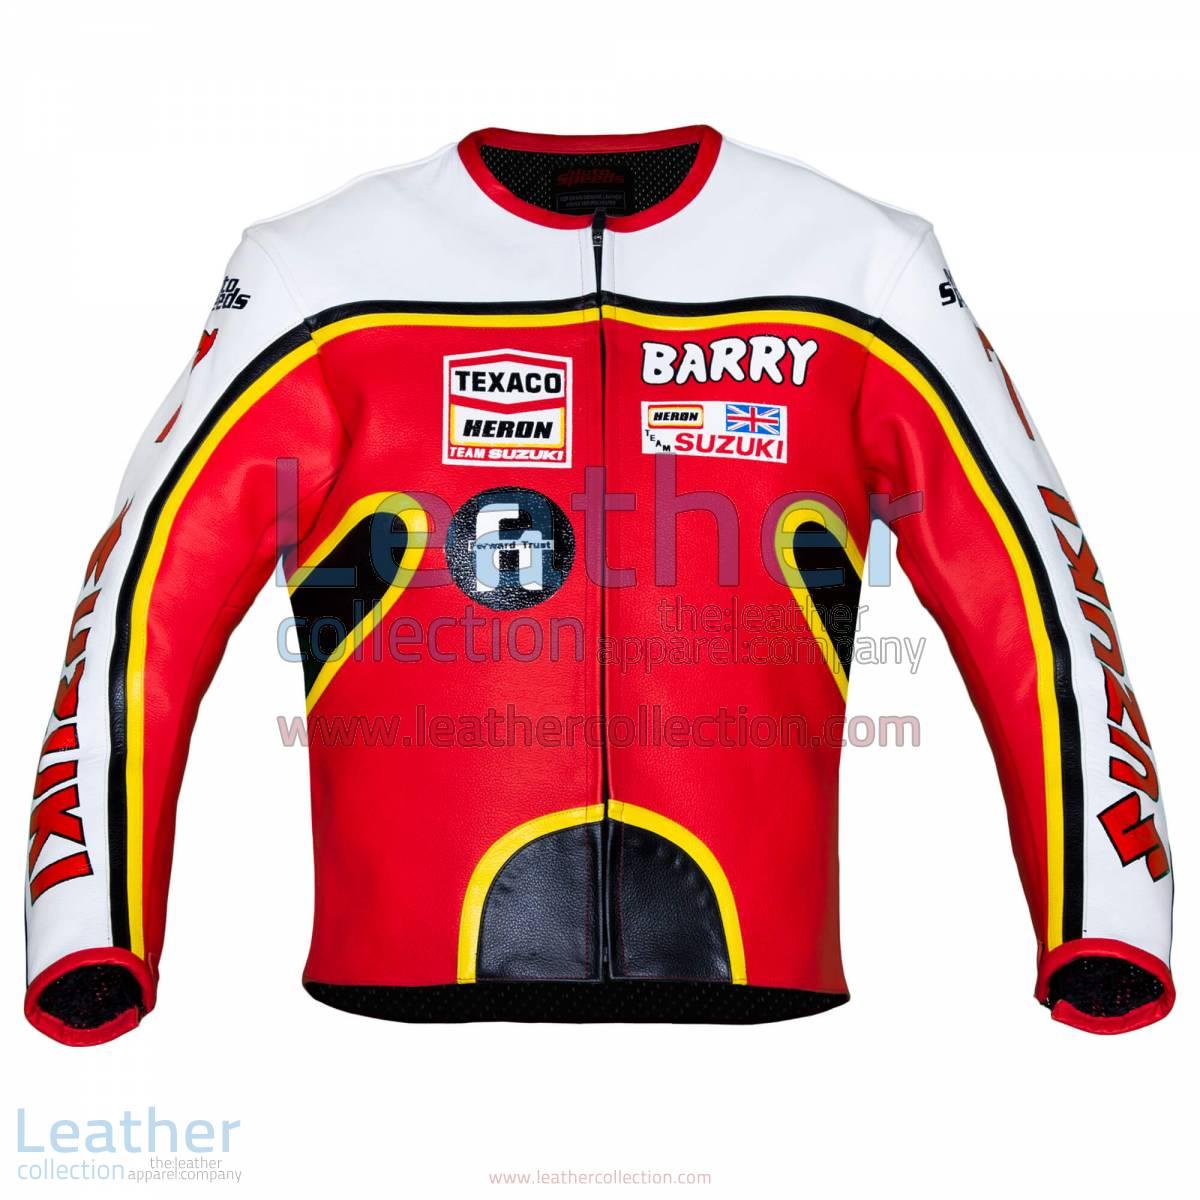 Barry Sheene Suzuki GP 1976 Leather Jacket   Barry Sheene Suzuki GP 1976 Leather Jacket